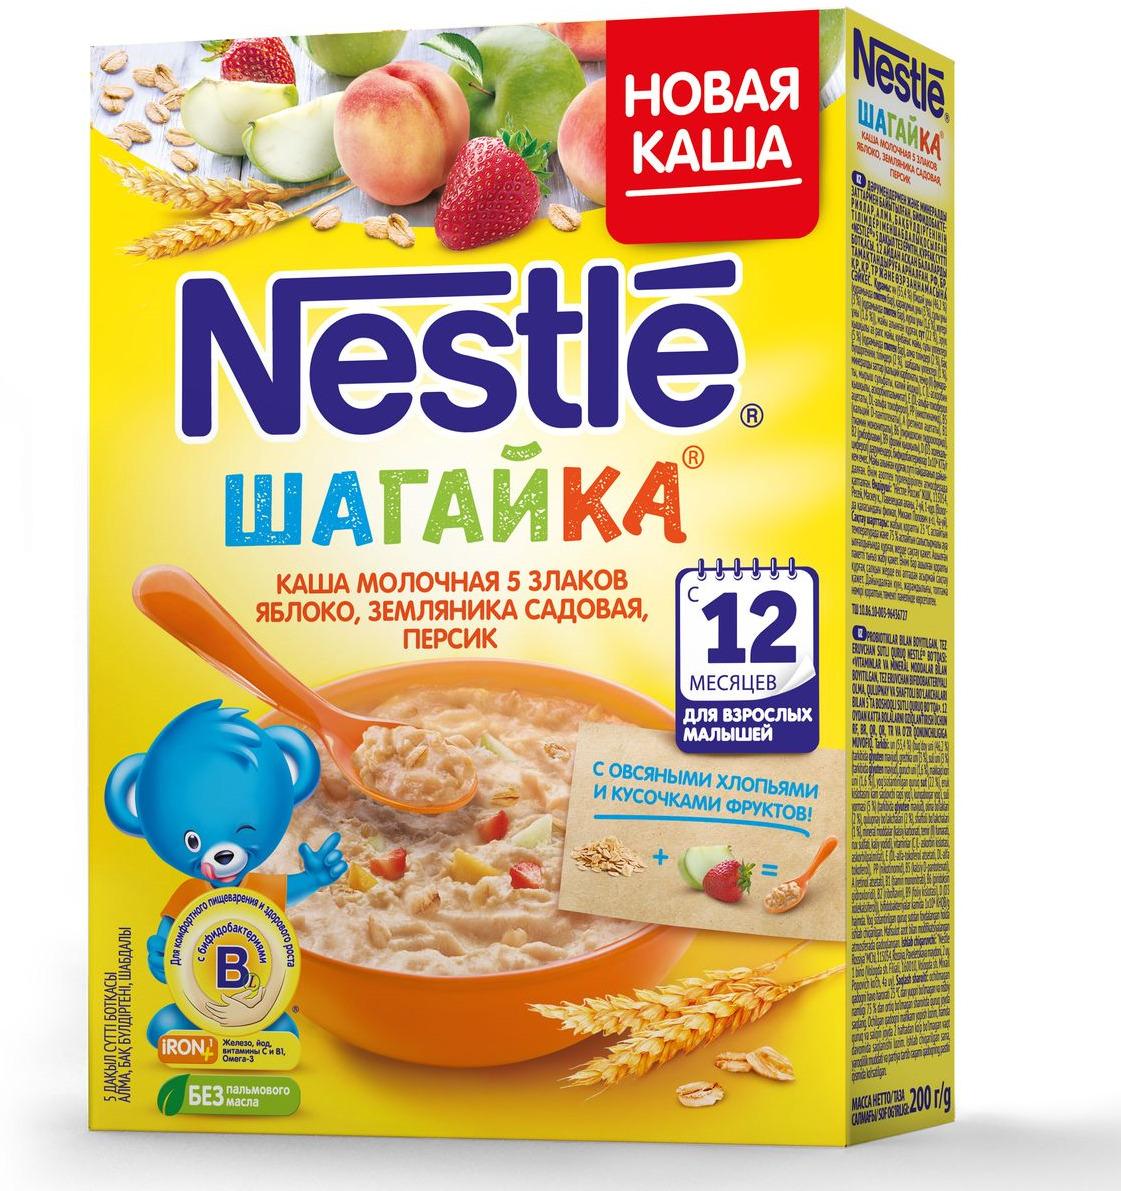 Nestle 5 злаков яблоко земляника персик каша молочная, 220 г nestle 900